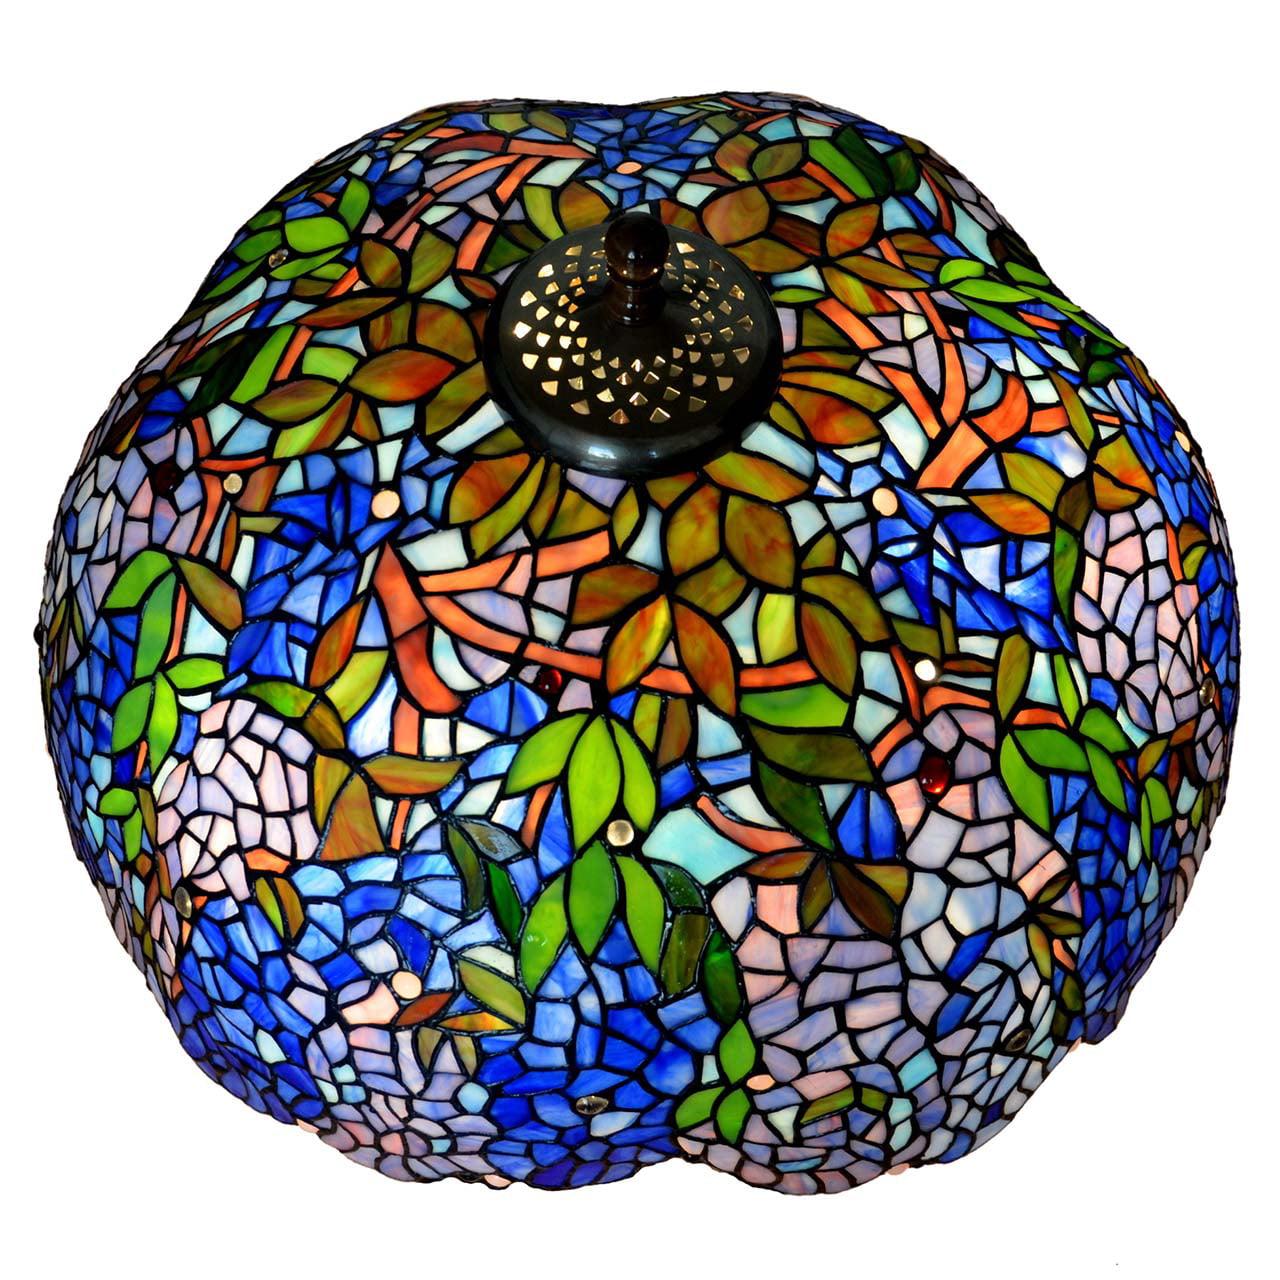 Bieye S10001 22 Inches Wisteria Tiffany Style Stained Glass Lampshade Walmart Com Walmart Com